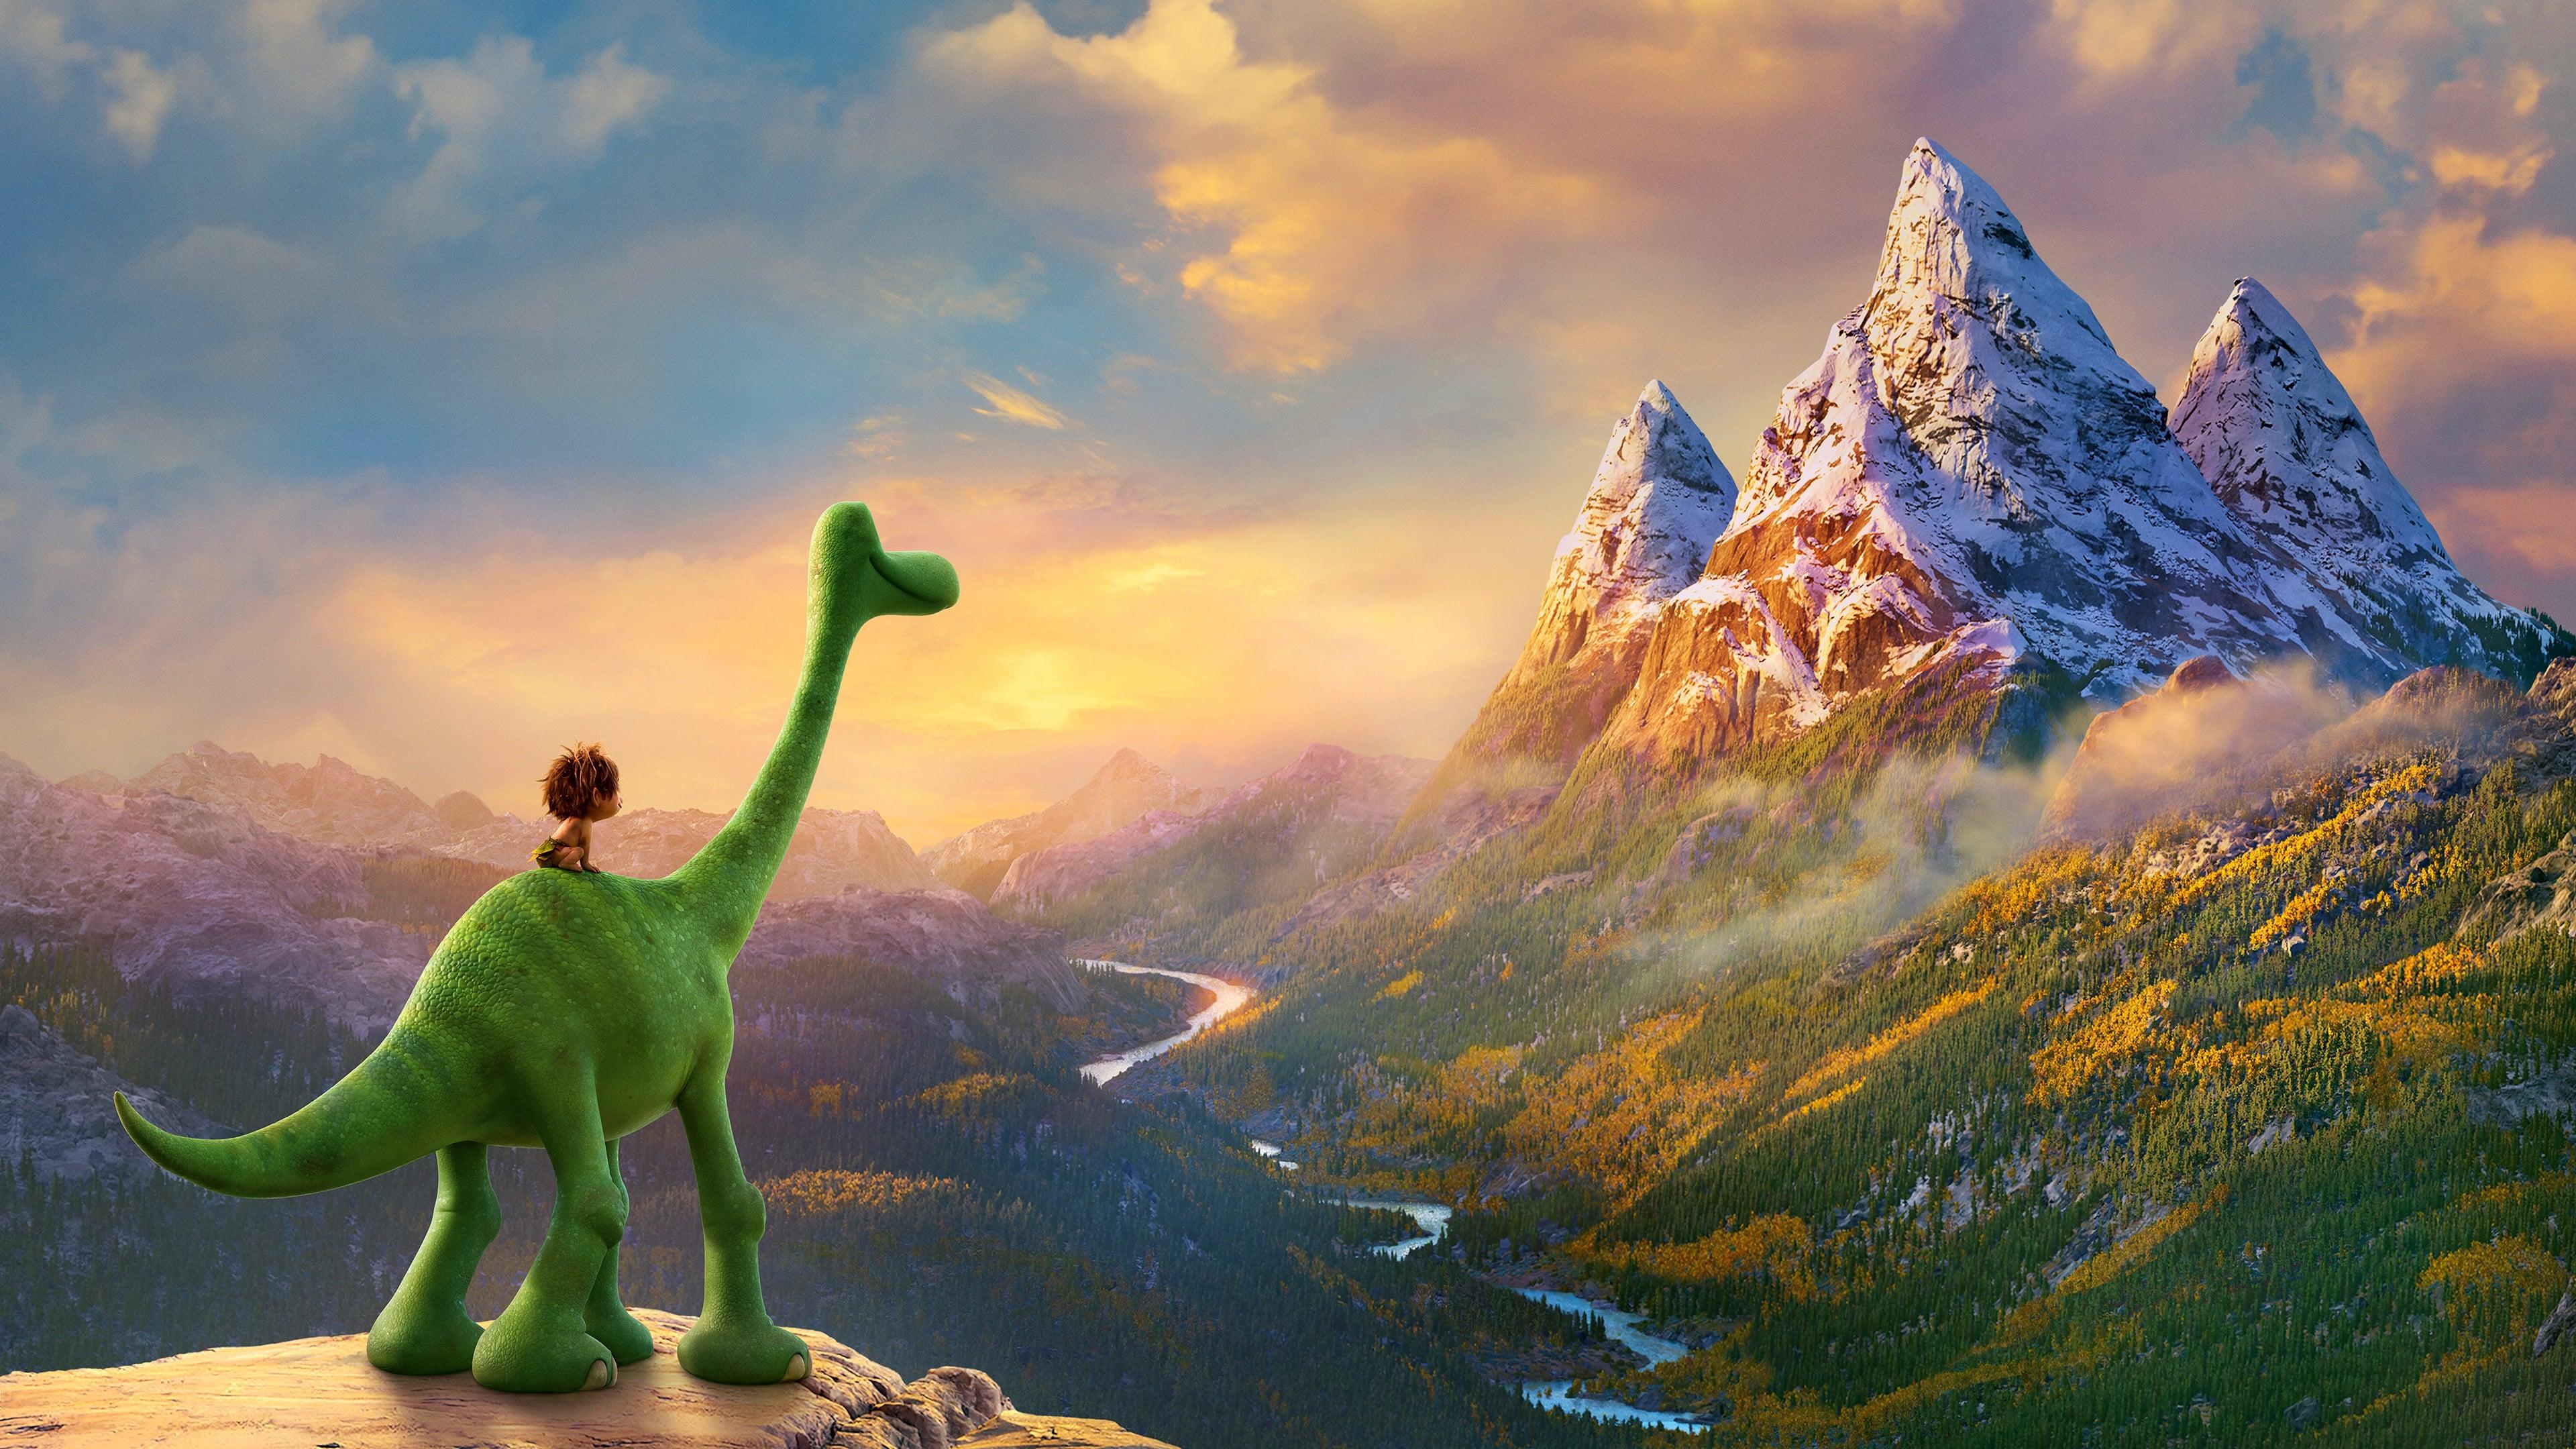 Walt Disney Wallpapers - The Good Dinosaur